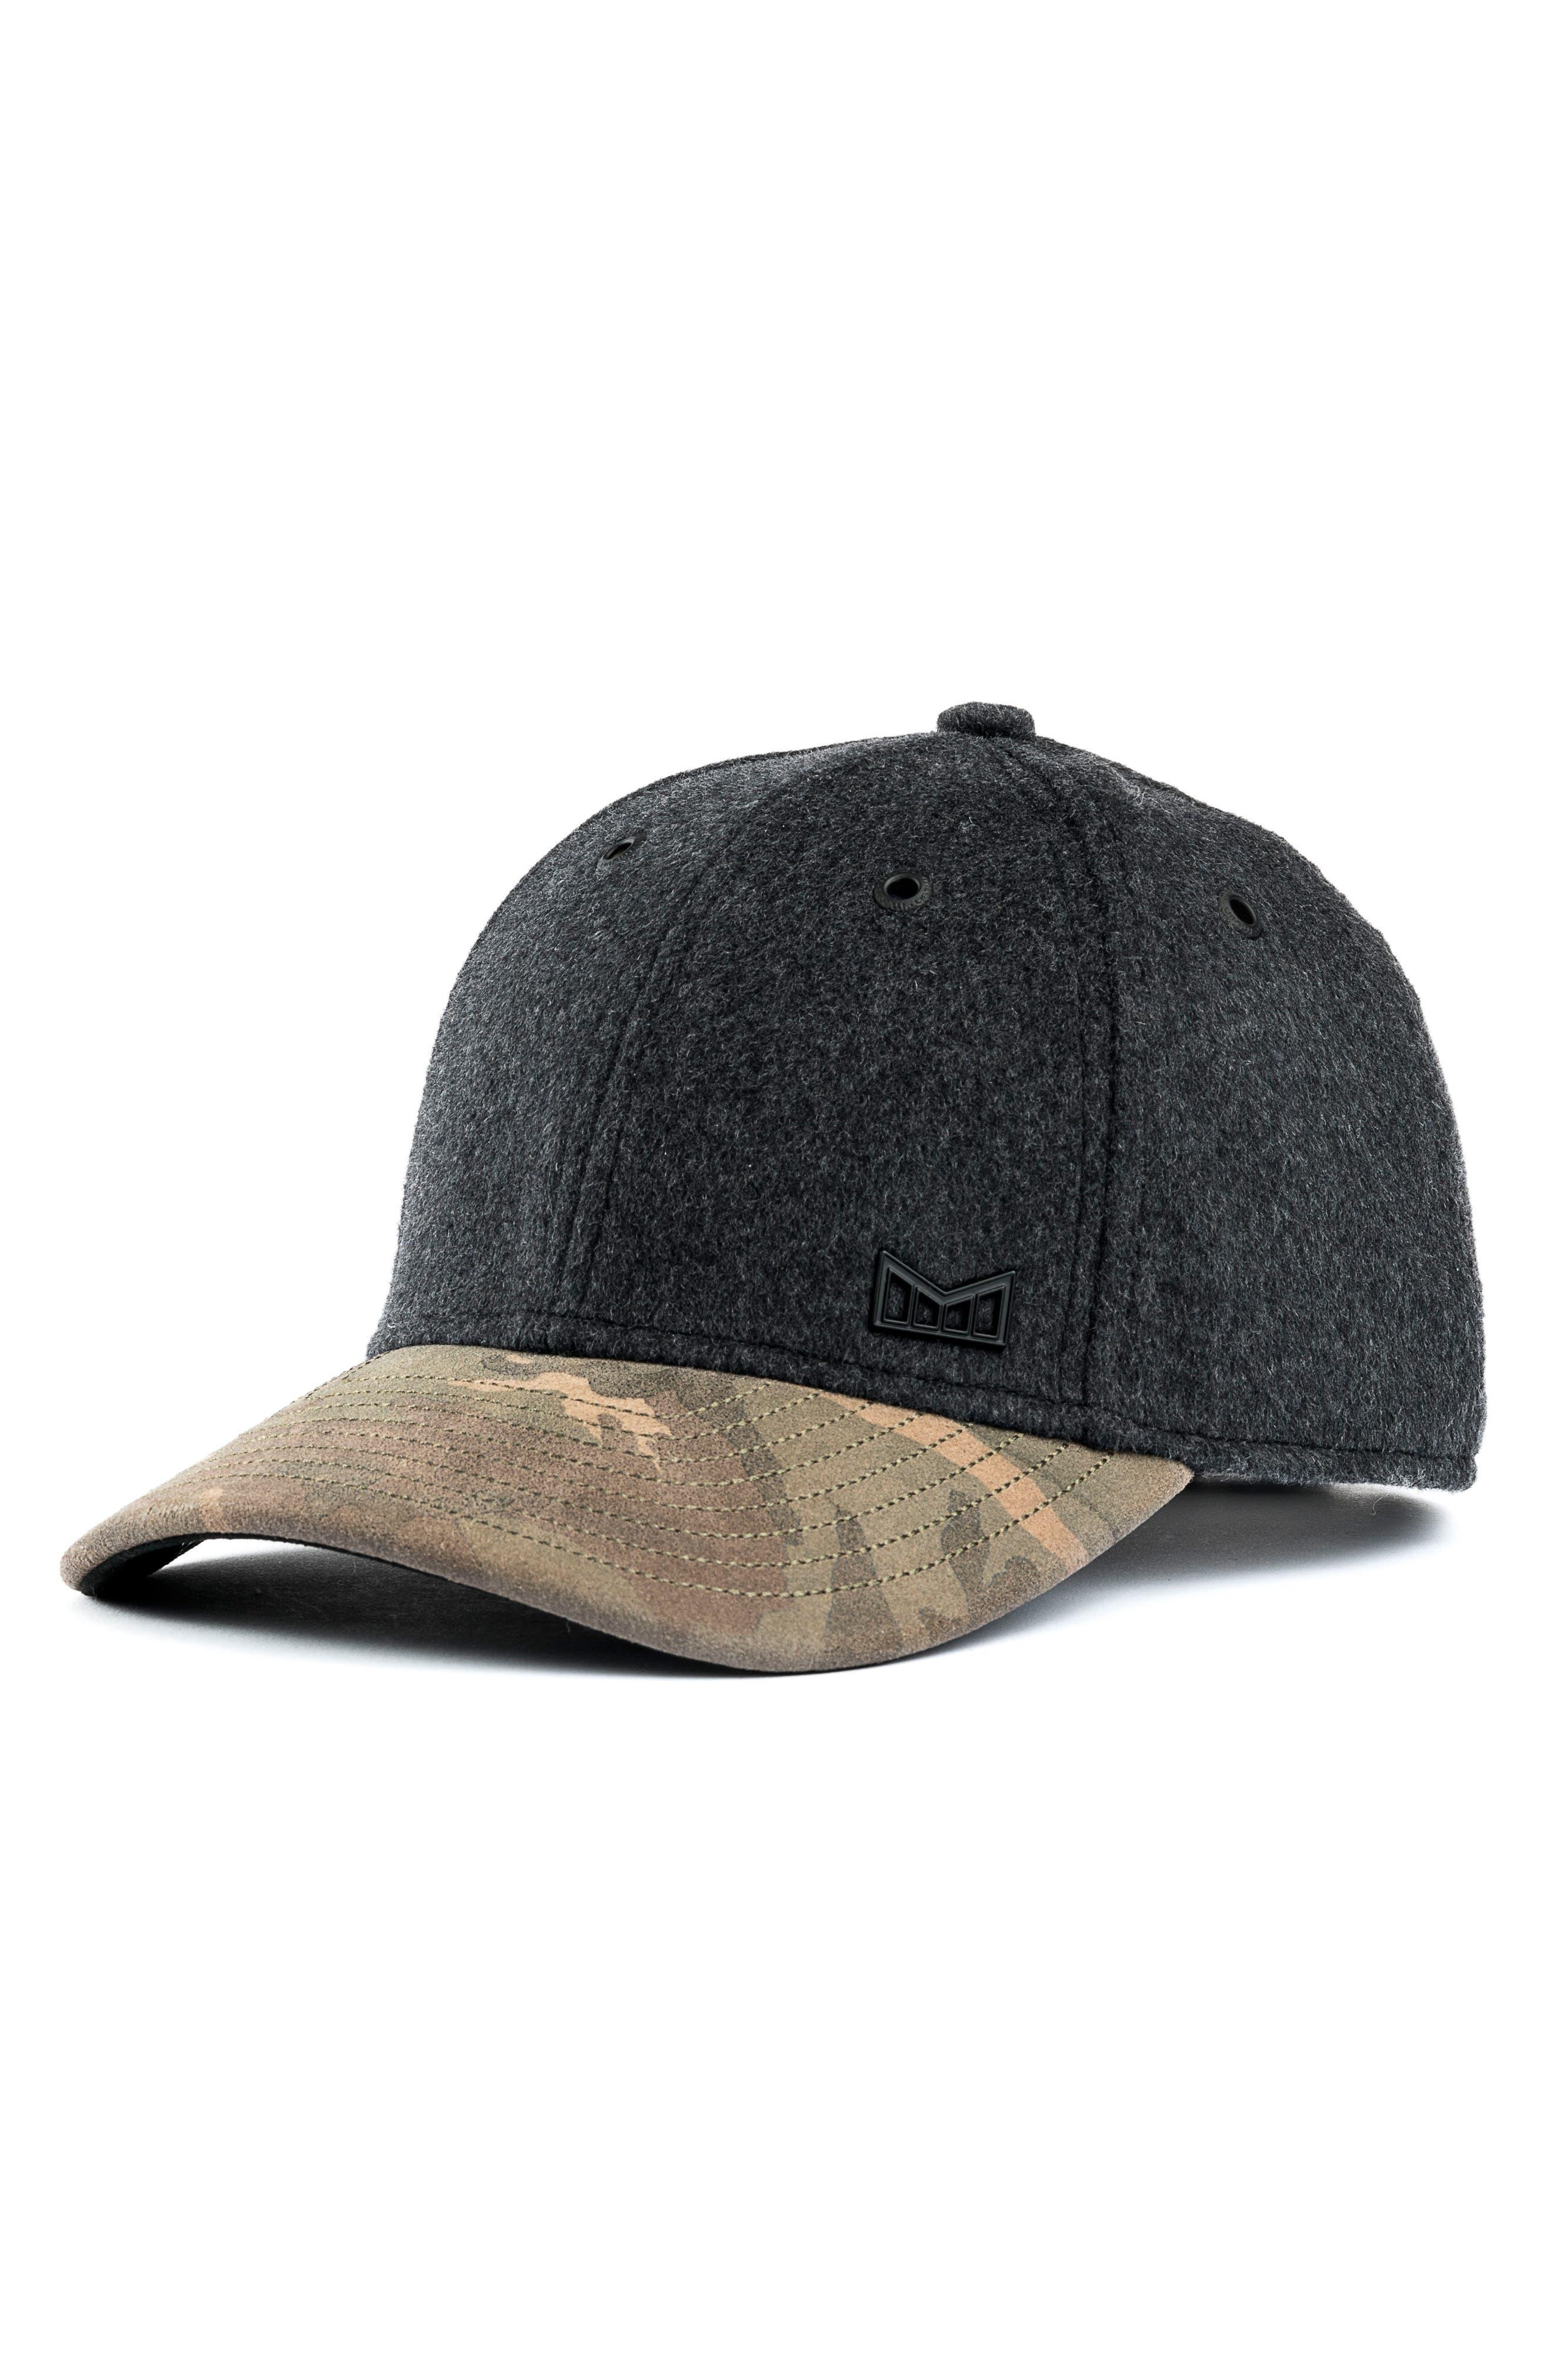 MELIN Maverick Ball Cap, Main, color, 021